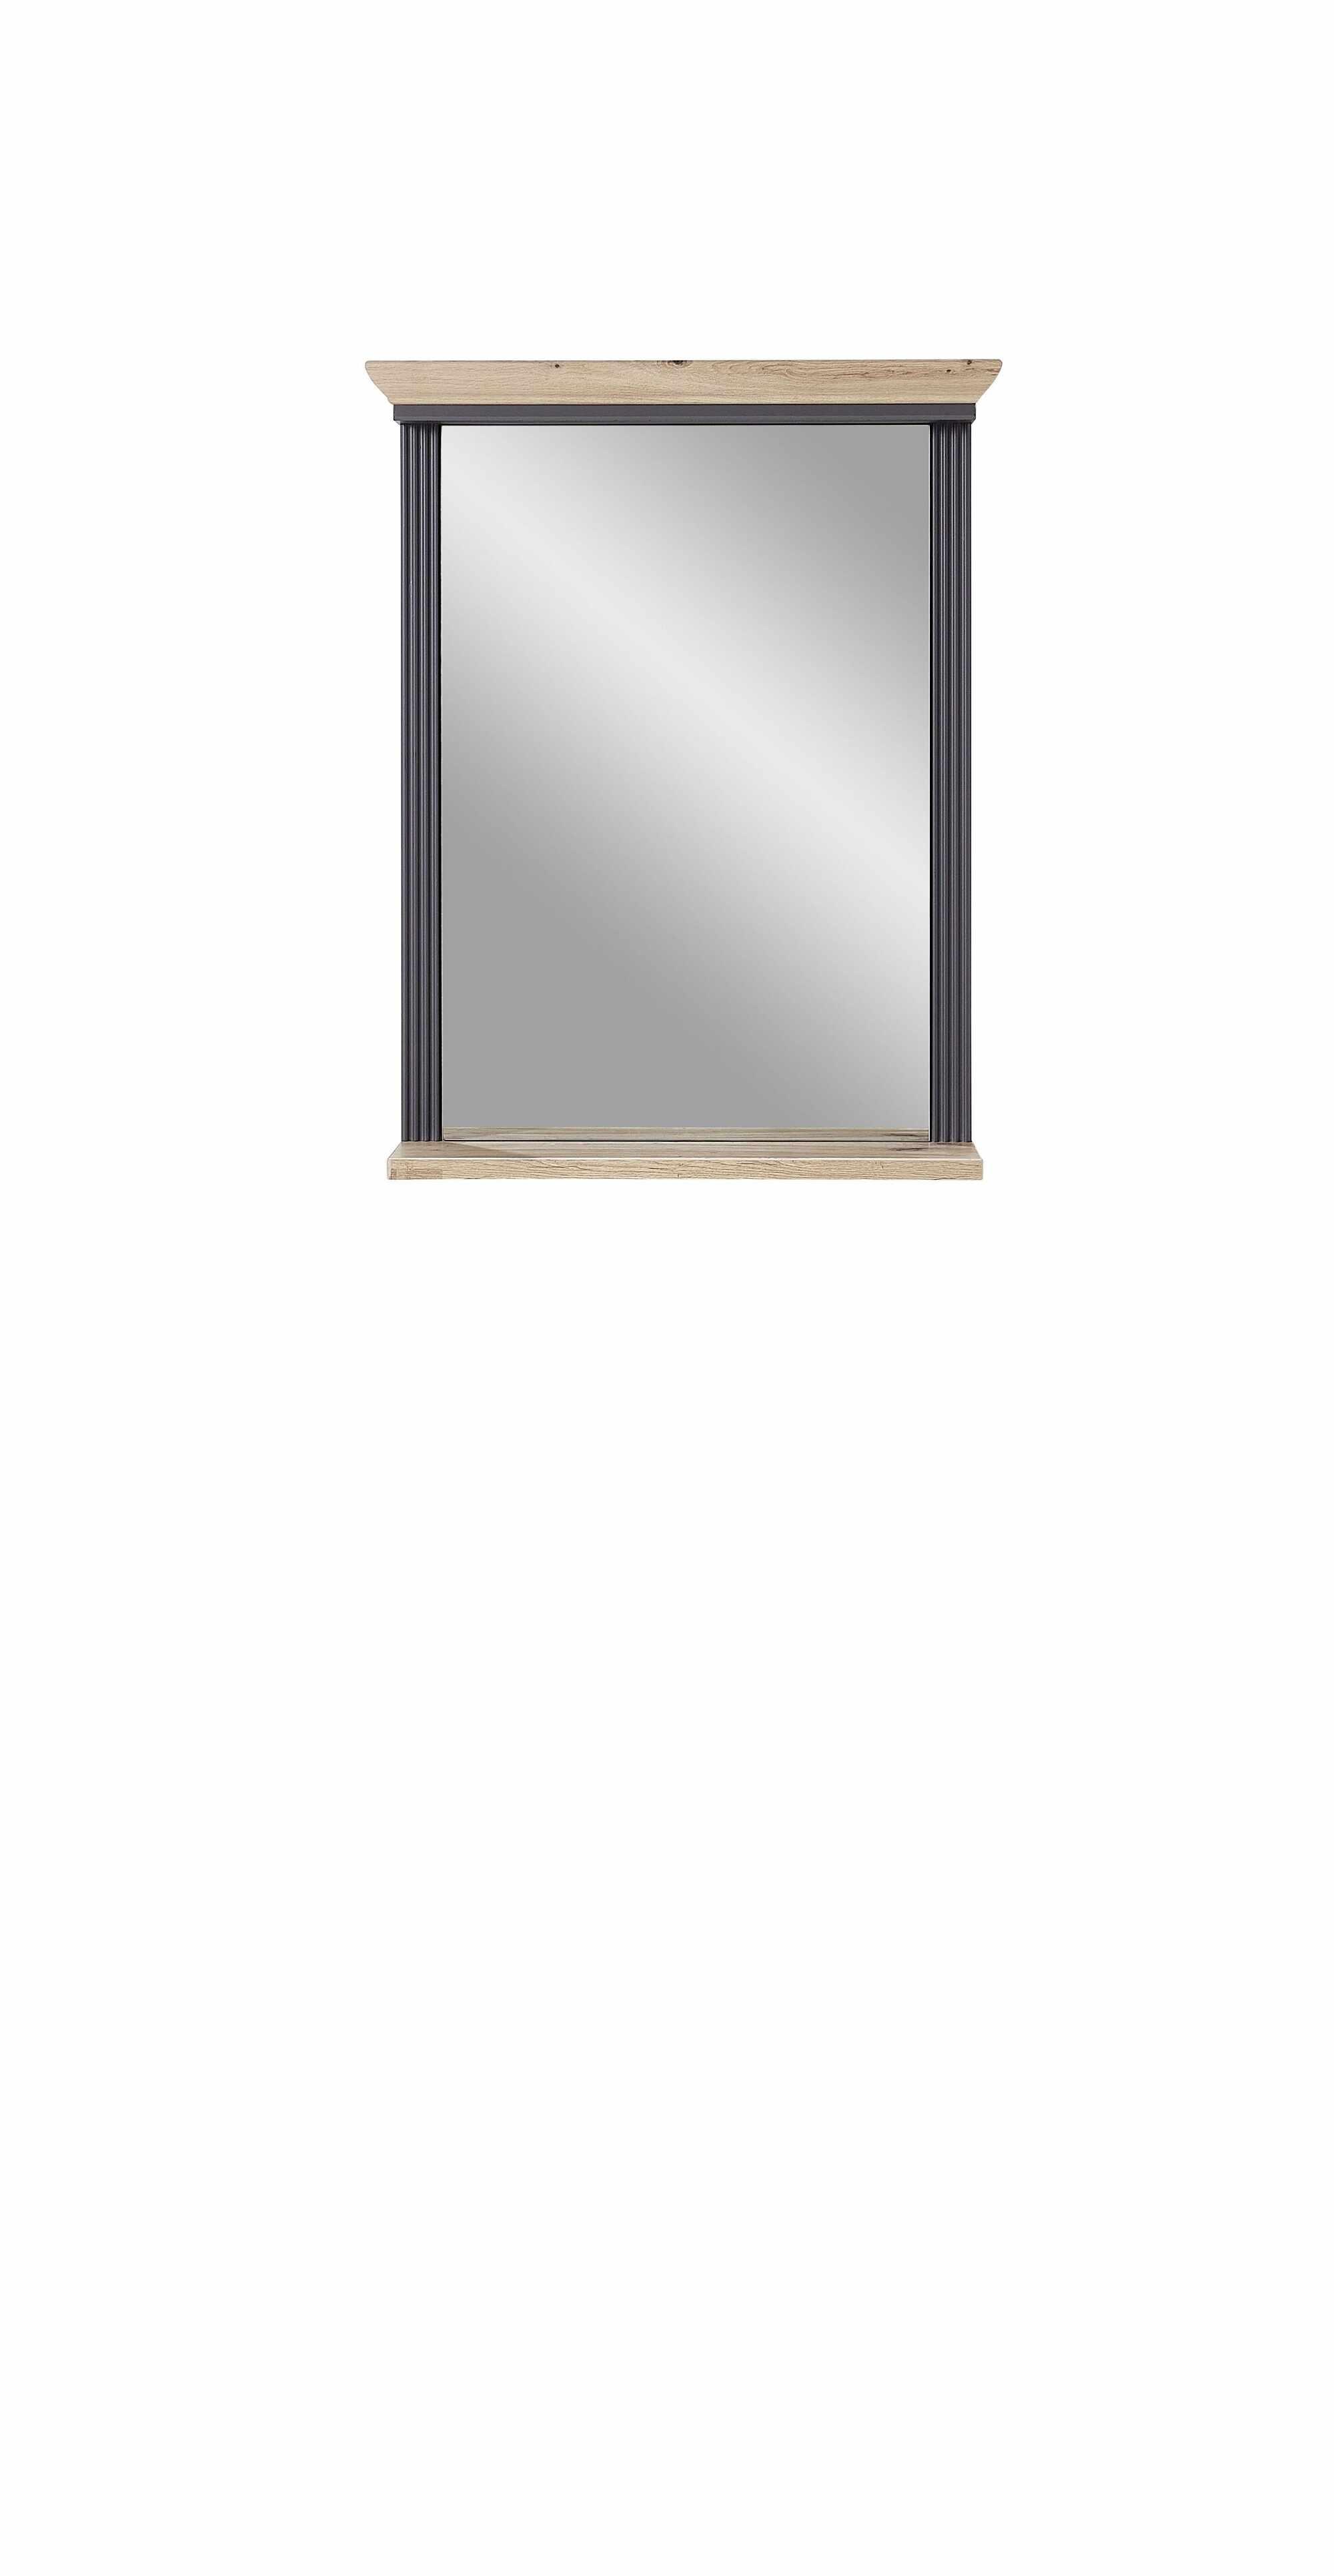 Oglinda decorativa cu rama din MDF, Jessie Grafit, l65xH83 cm la pret 399 lei